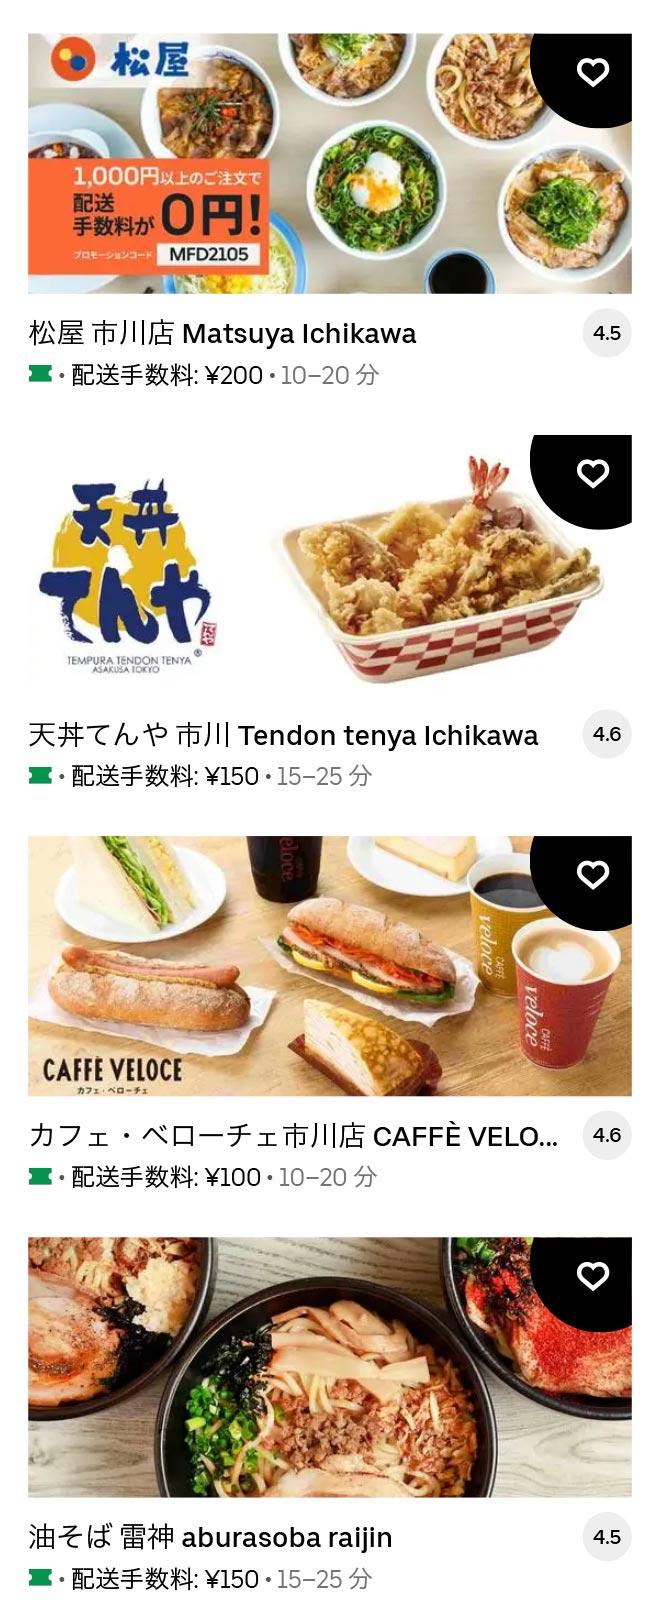 U ichikawa 2105 04